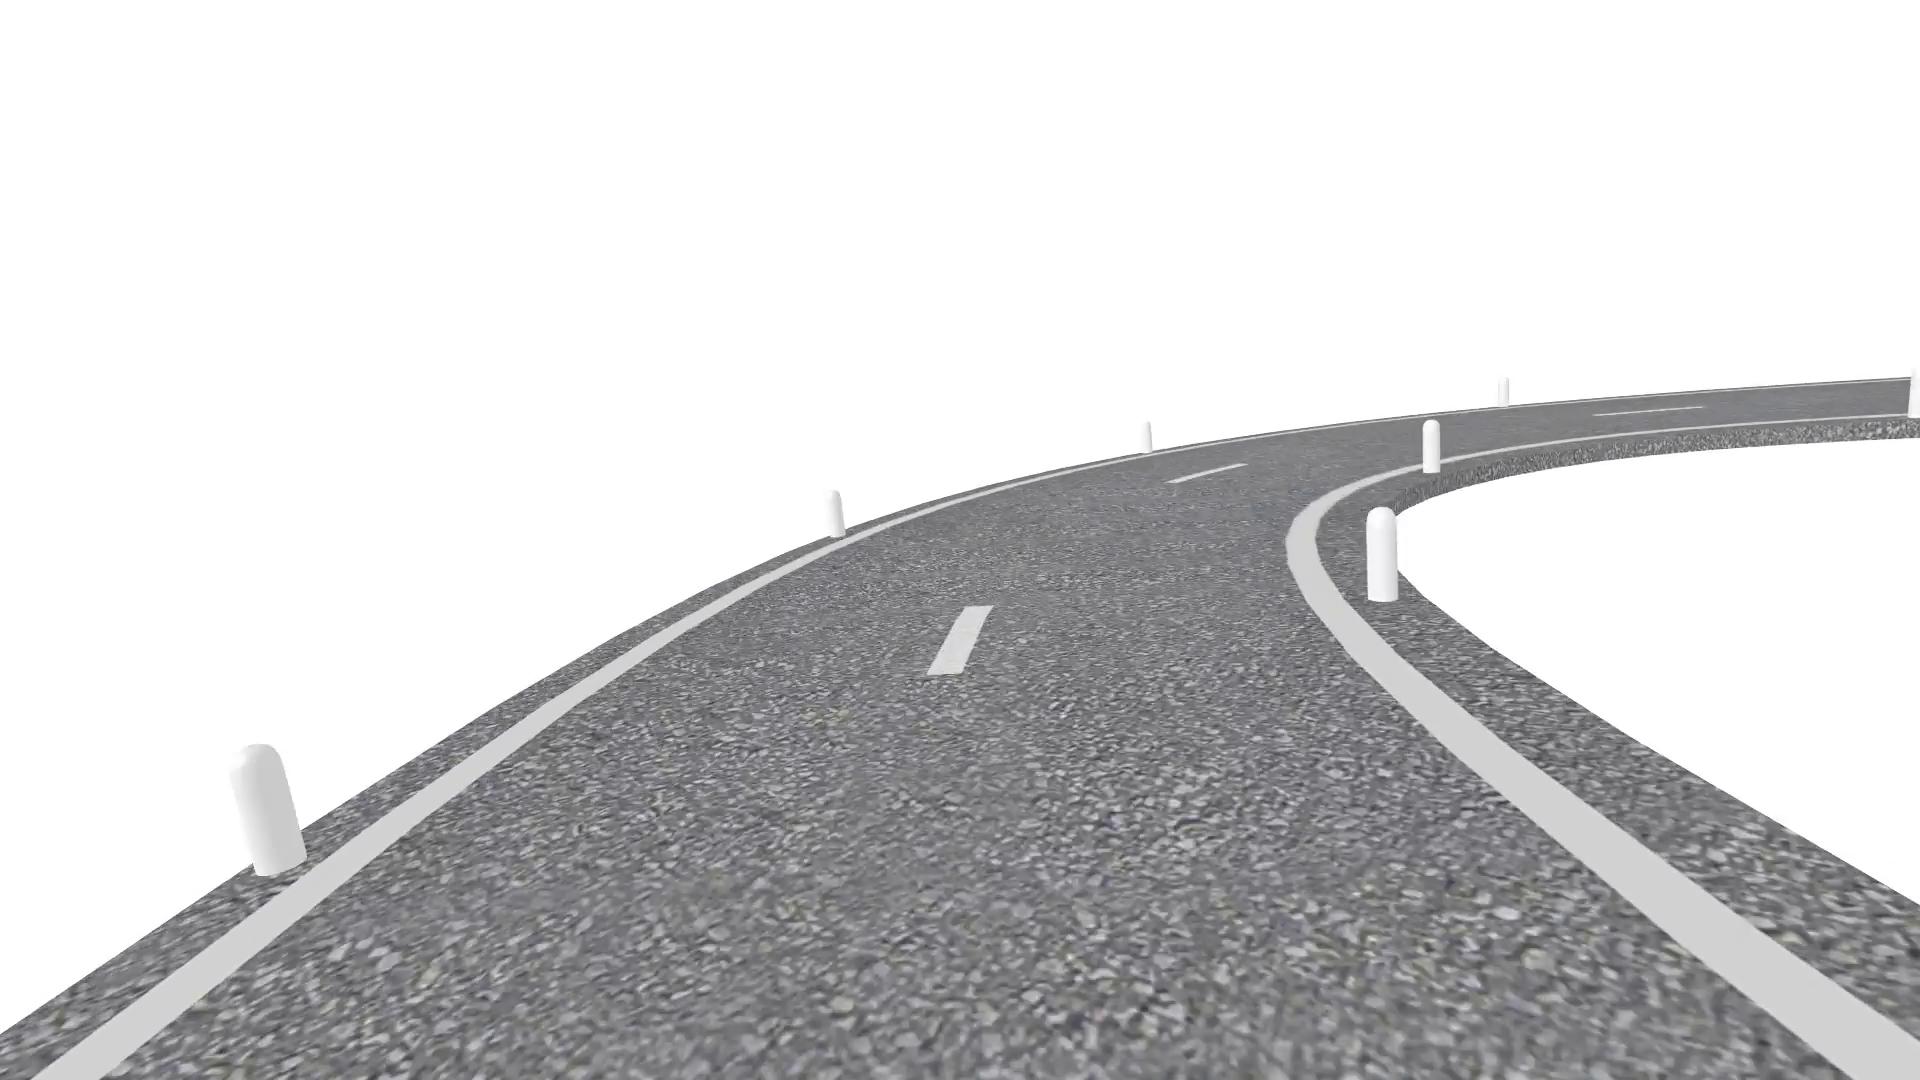 Winding Road PNG HD - 137033